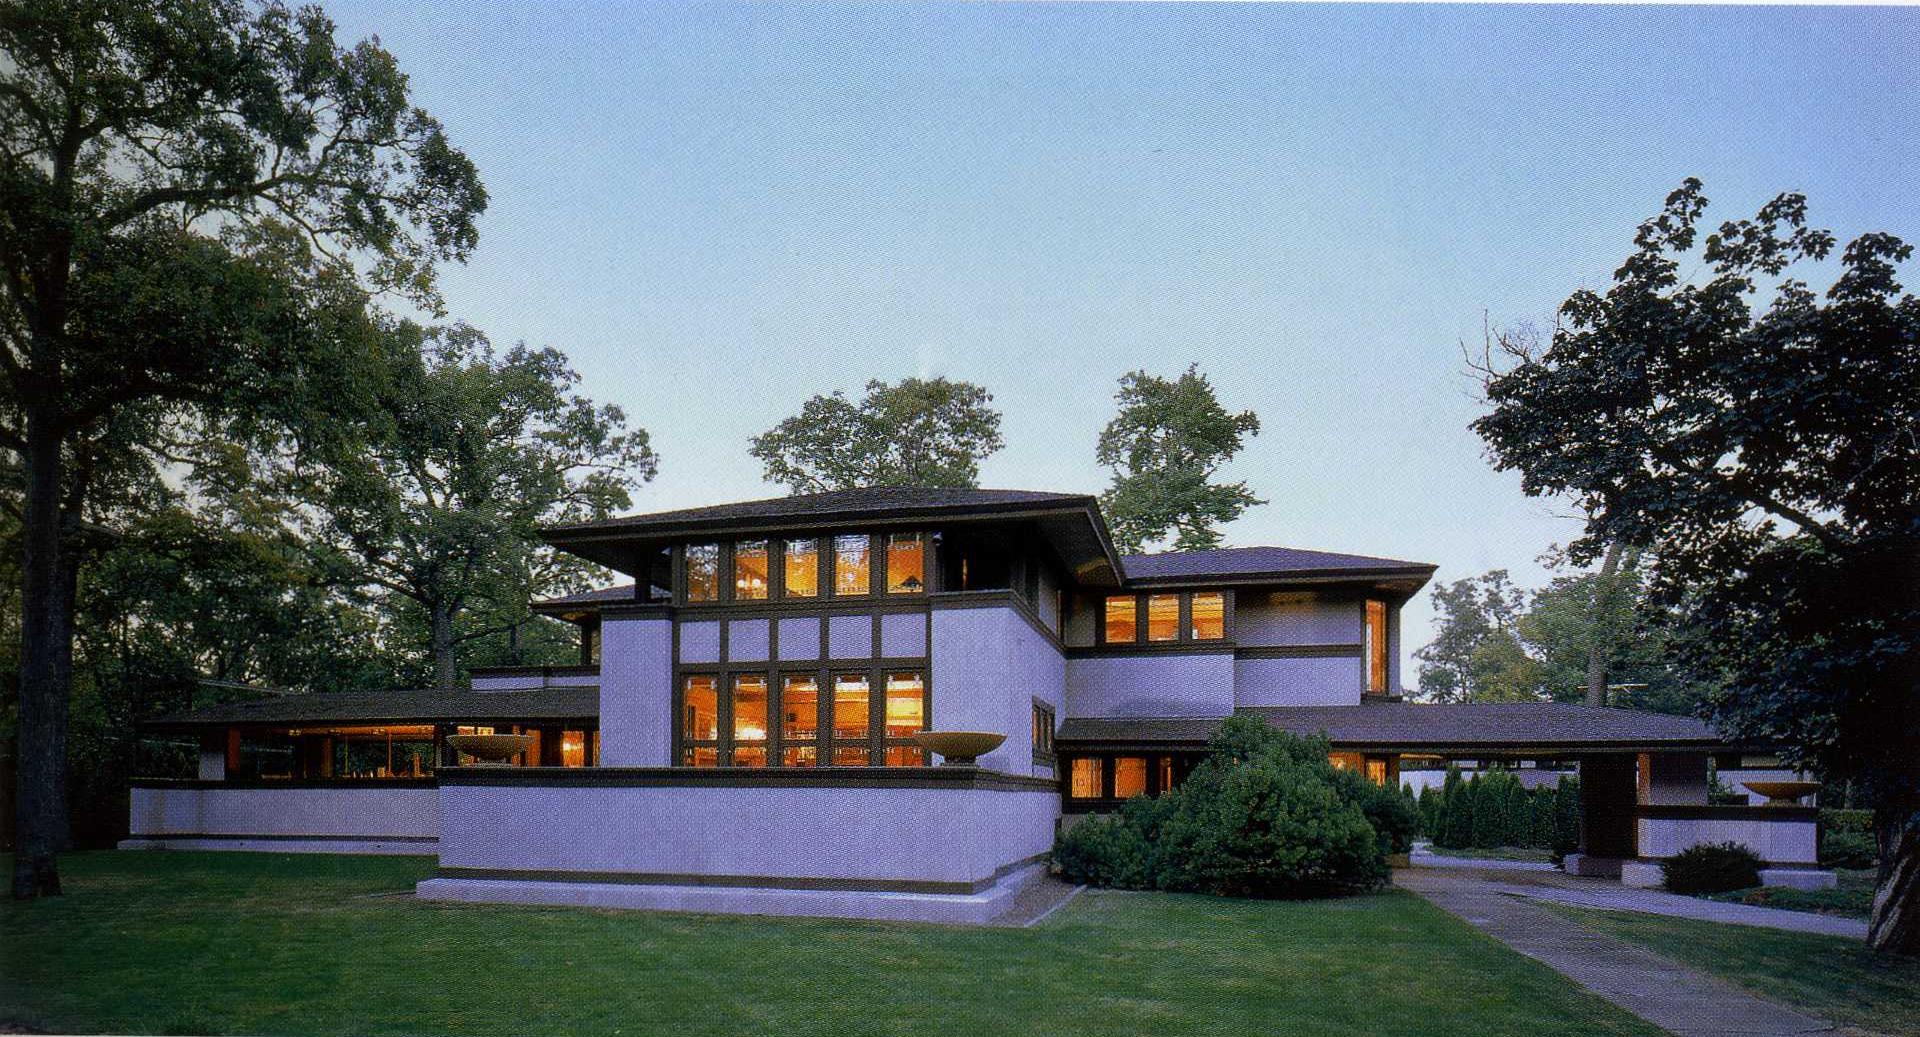 Ward w willits house data photos plans - Casa y decoracion ...